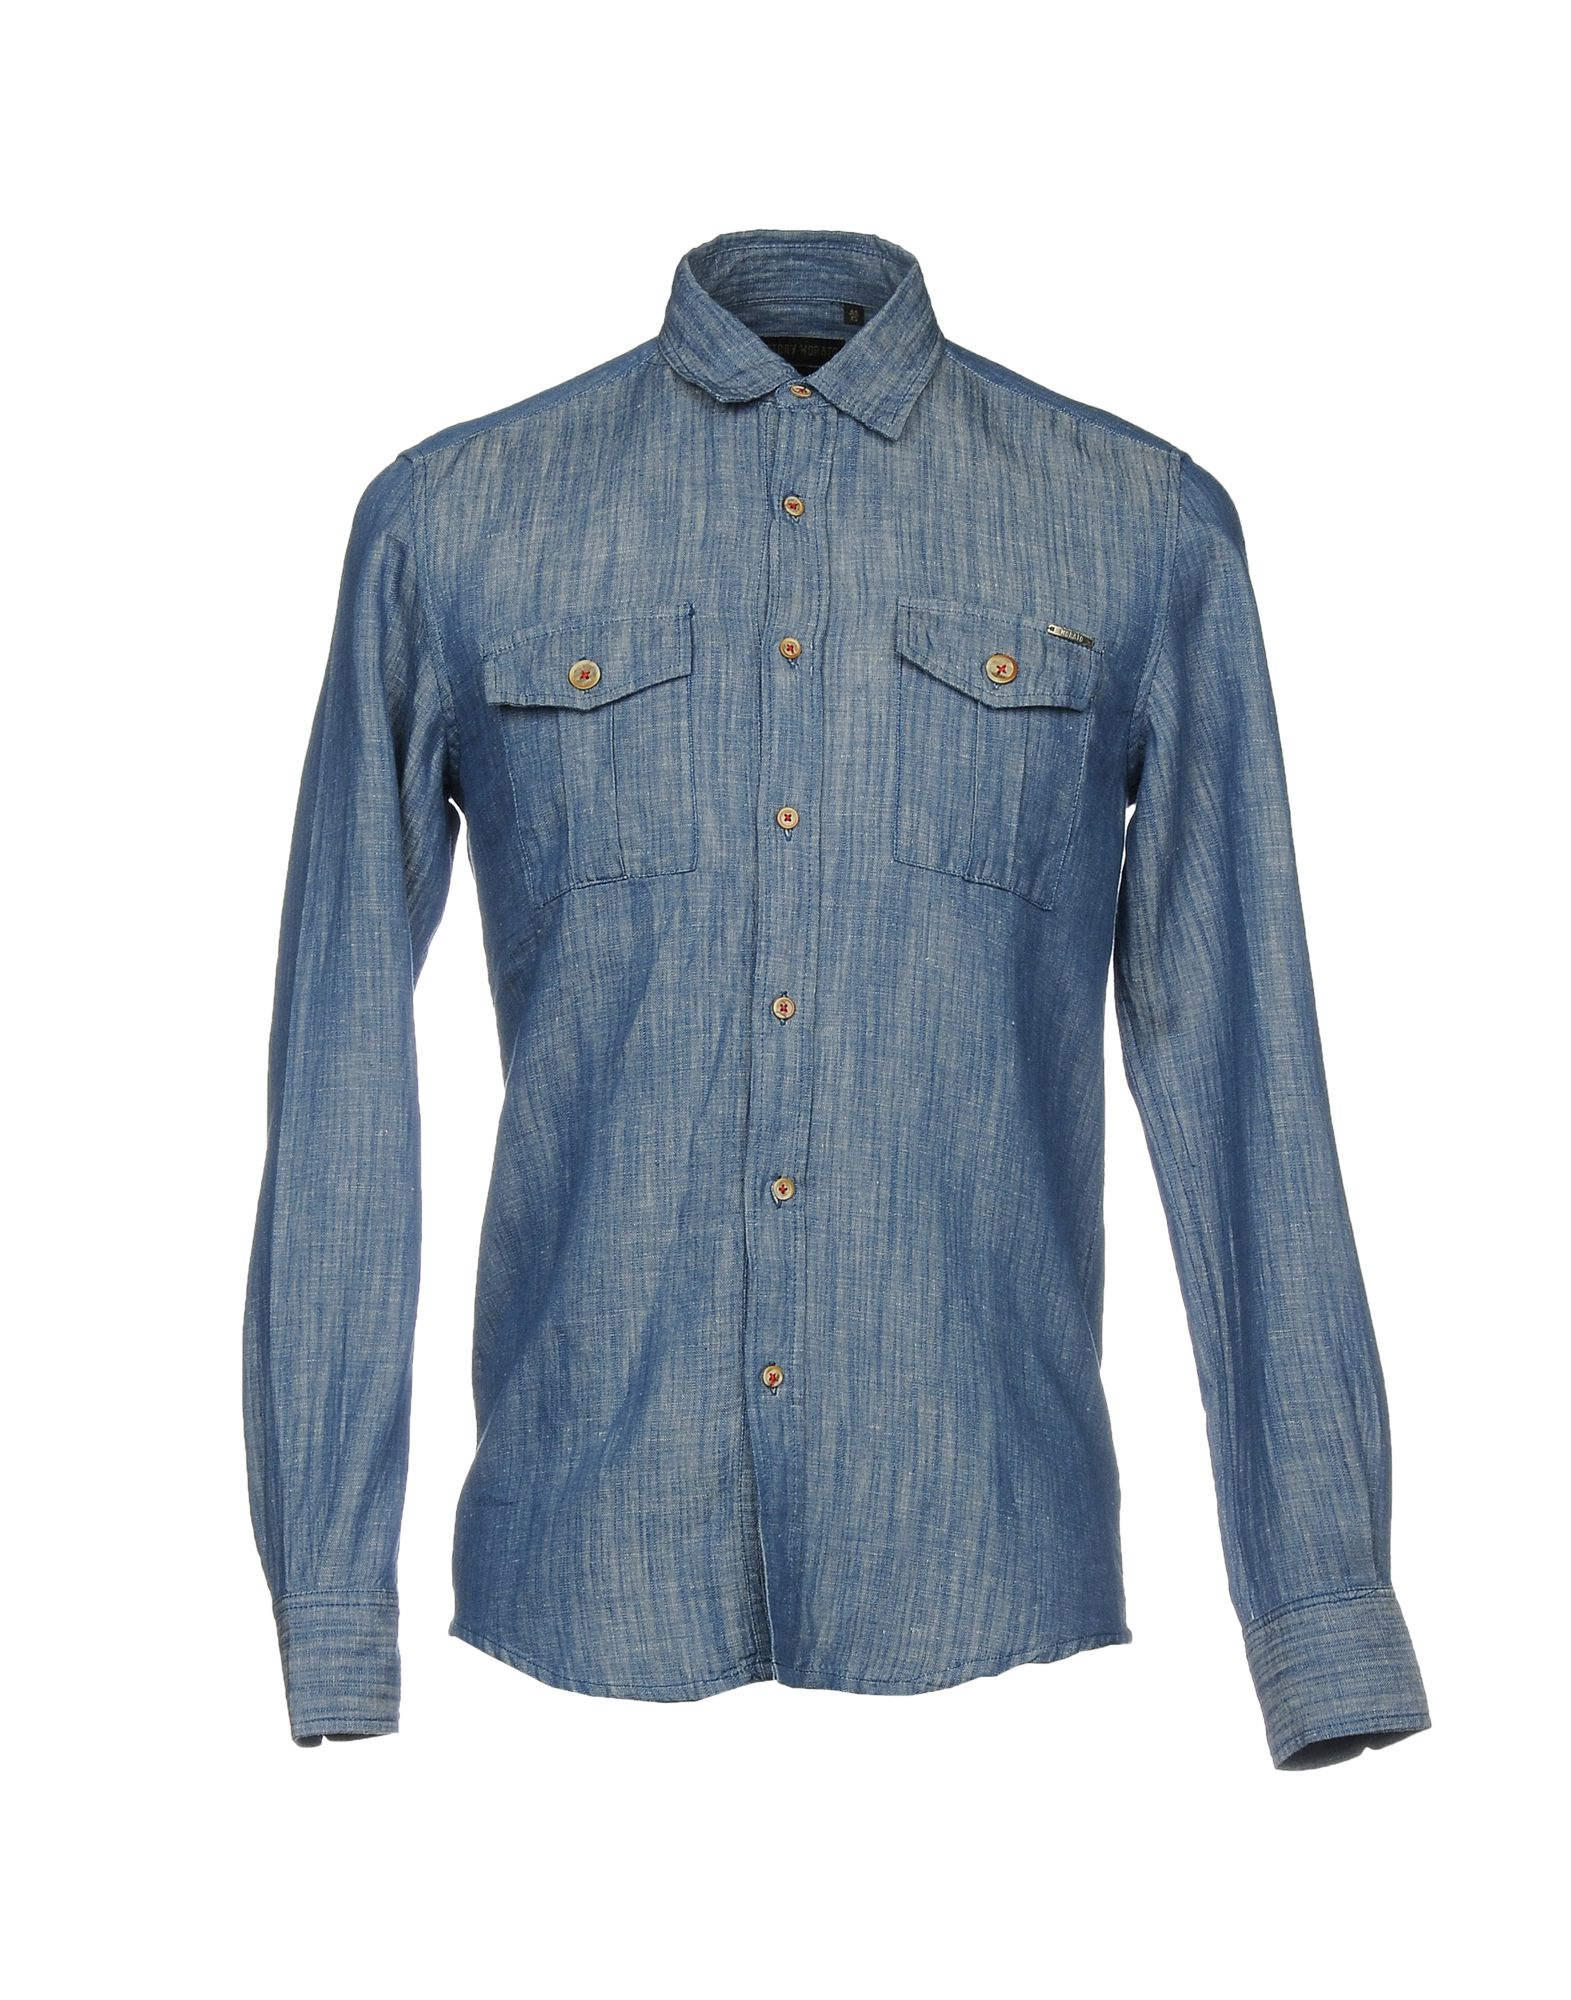 ANTONY MORATO Джинсовая рубашка antony morato рубашка